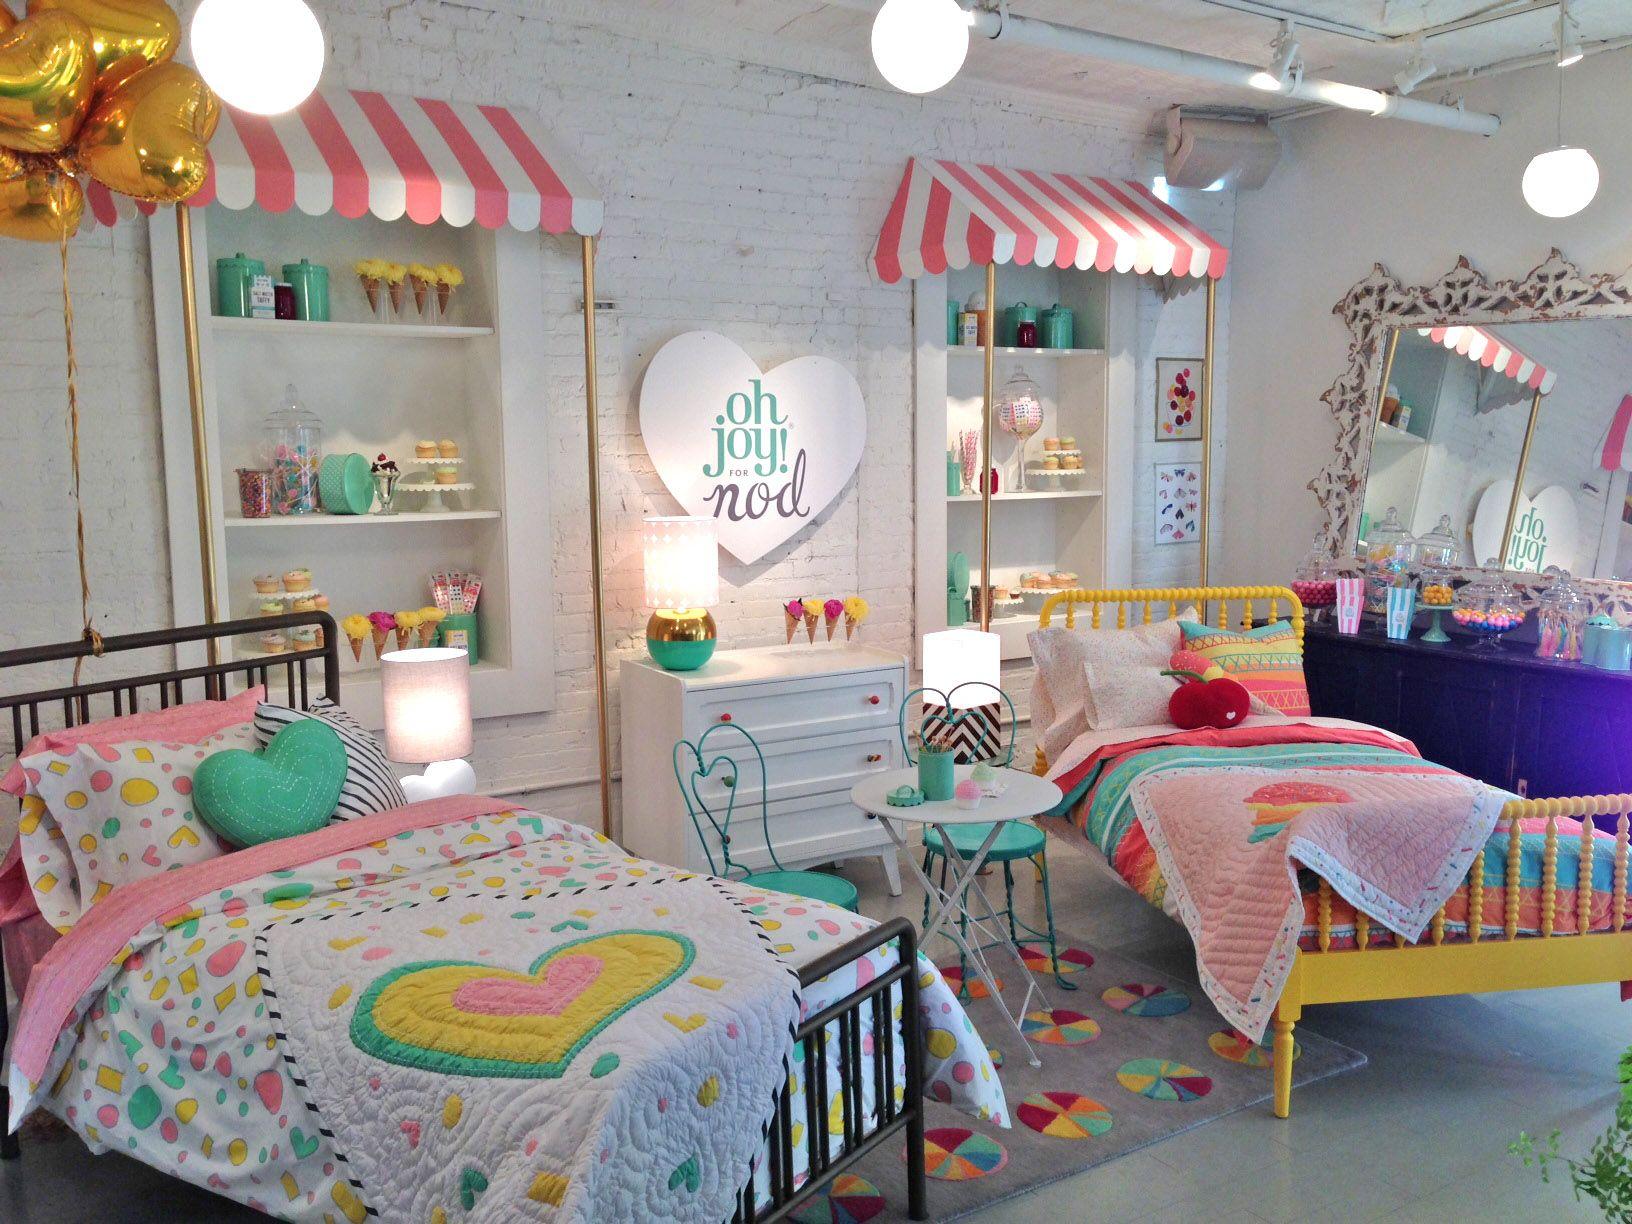 Ice cream shop to introduce Oh Joy! for Nod.